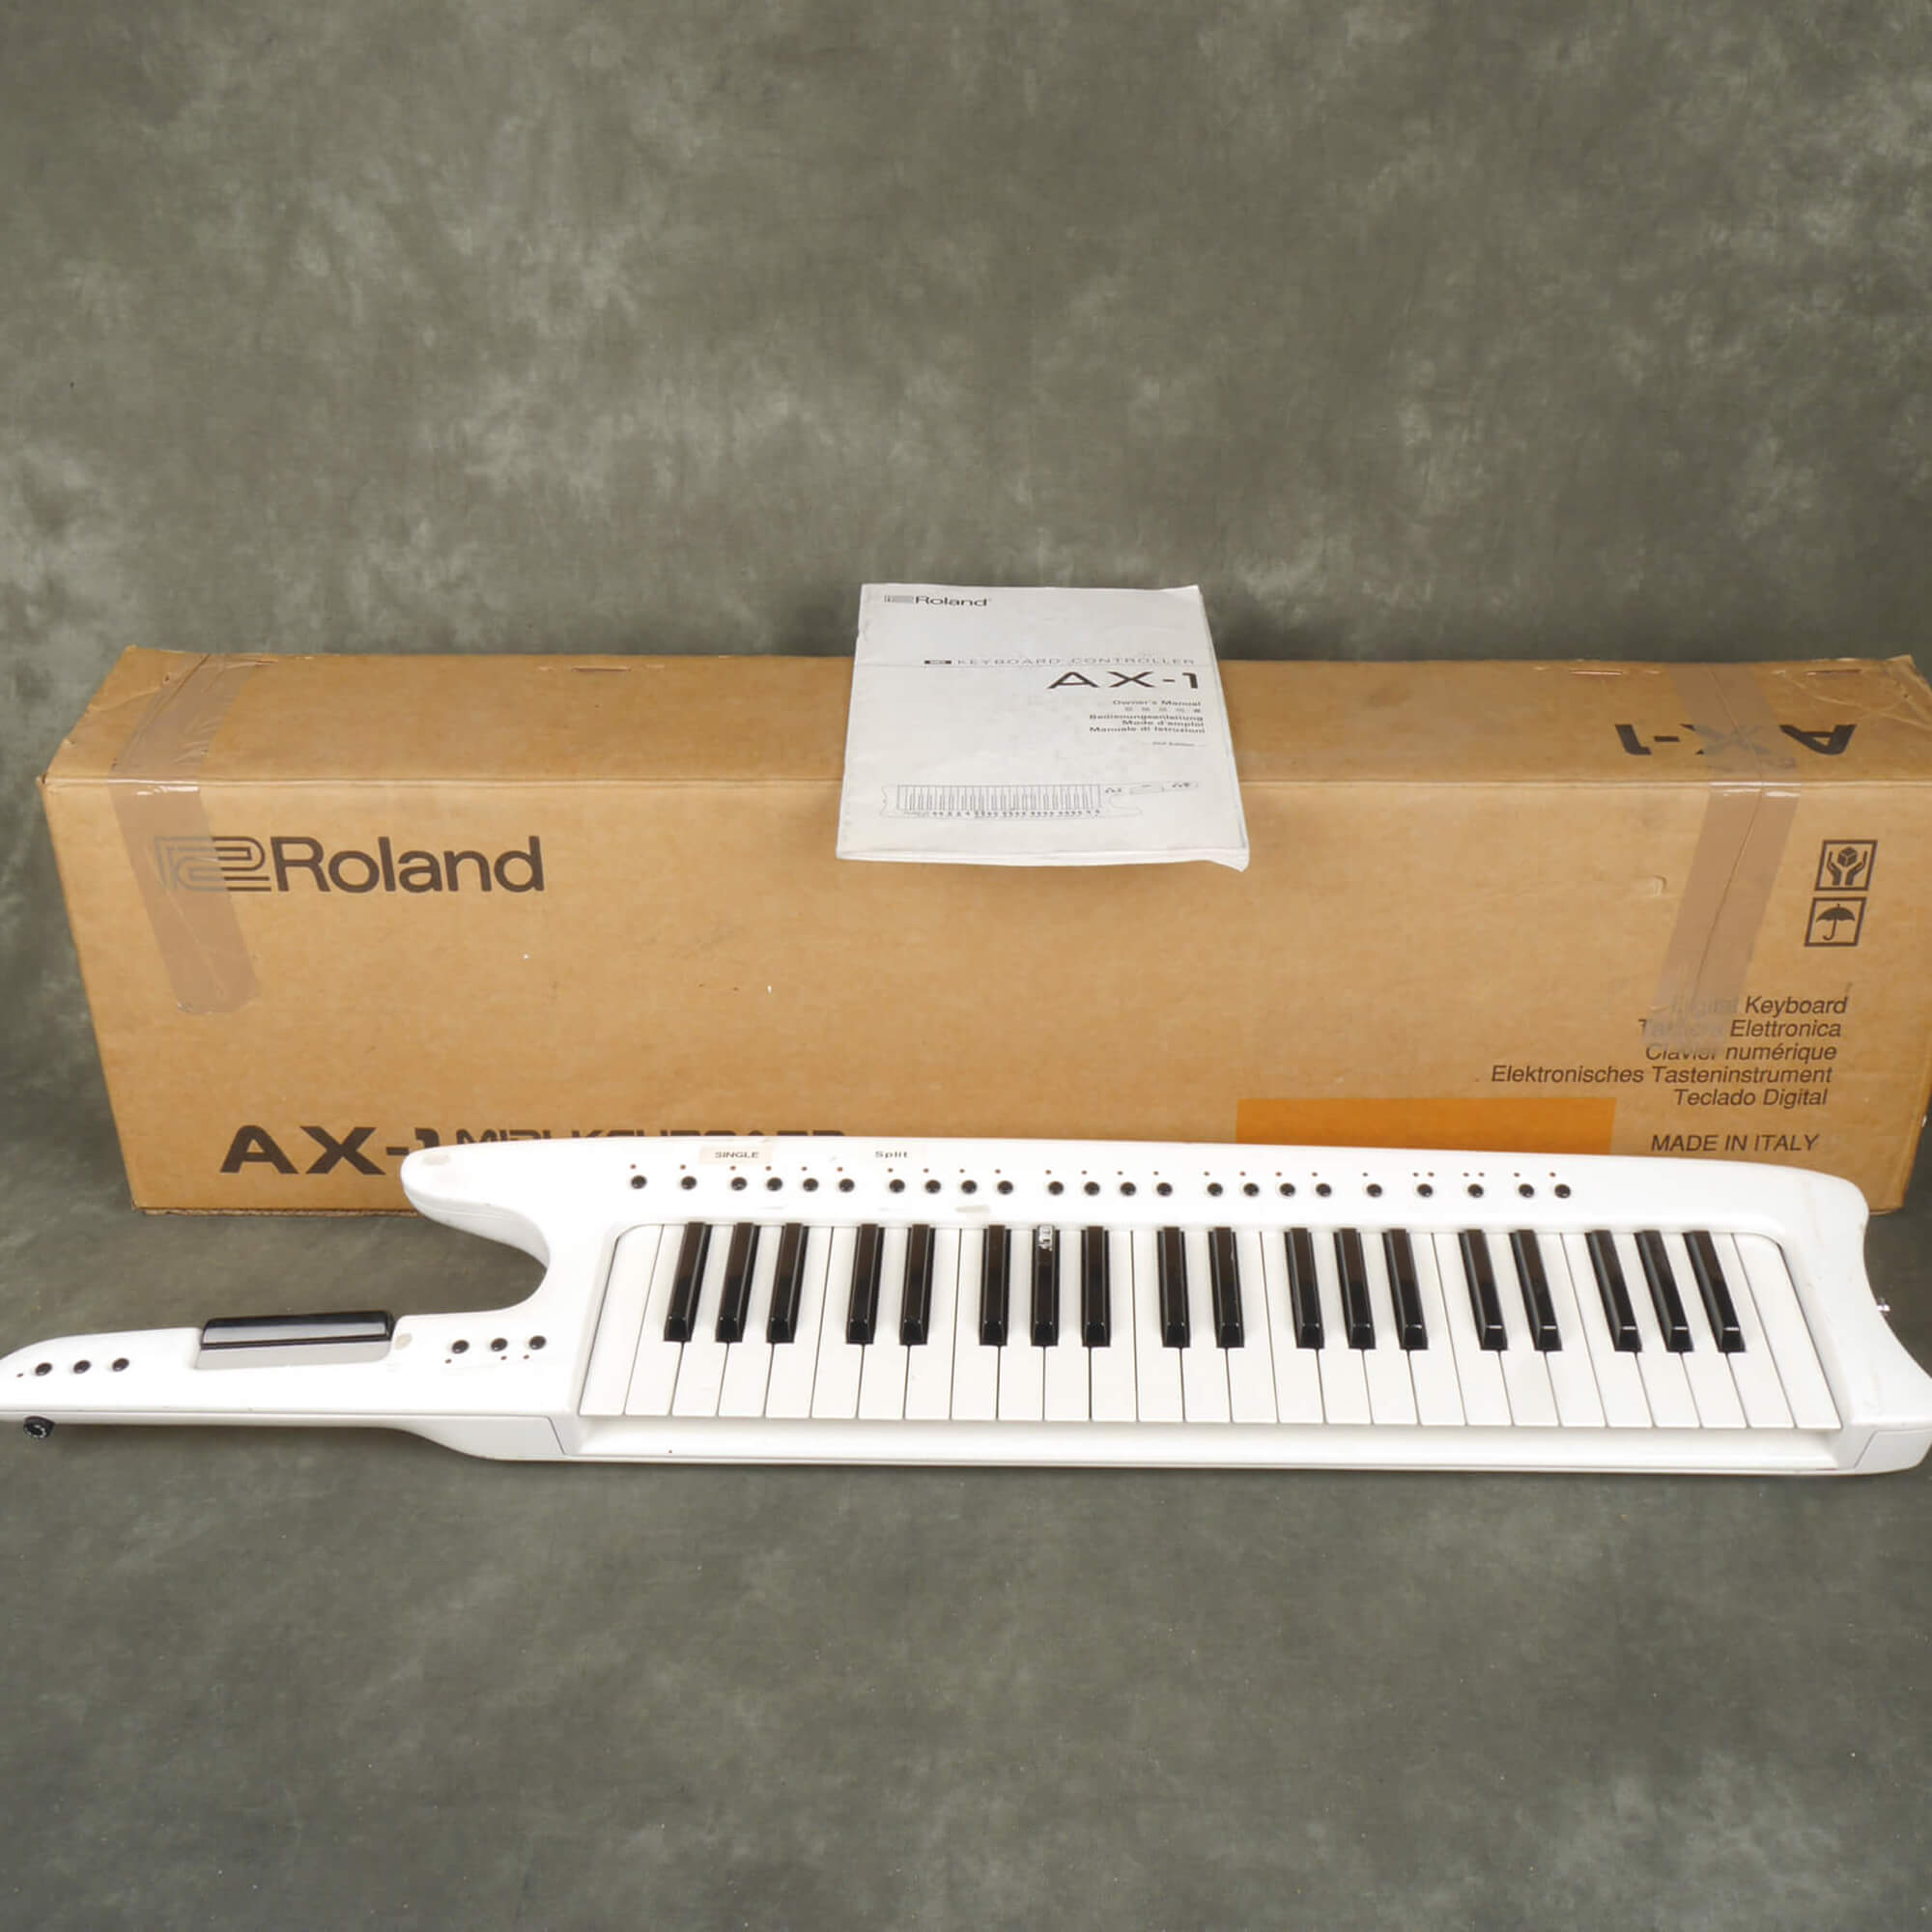 Roland AX1 Midi Remote Keyboard Modified - White w/Box - 2nd Hand